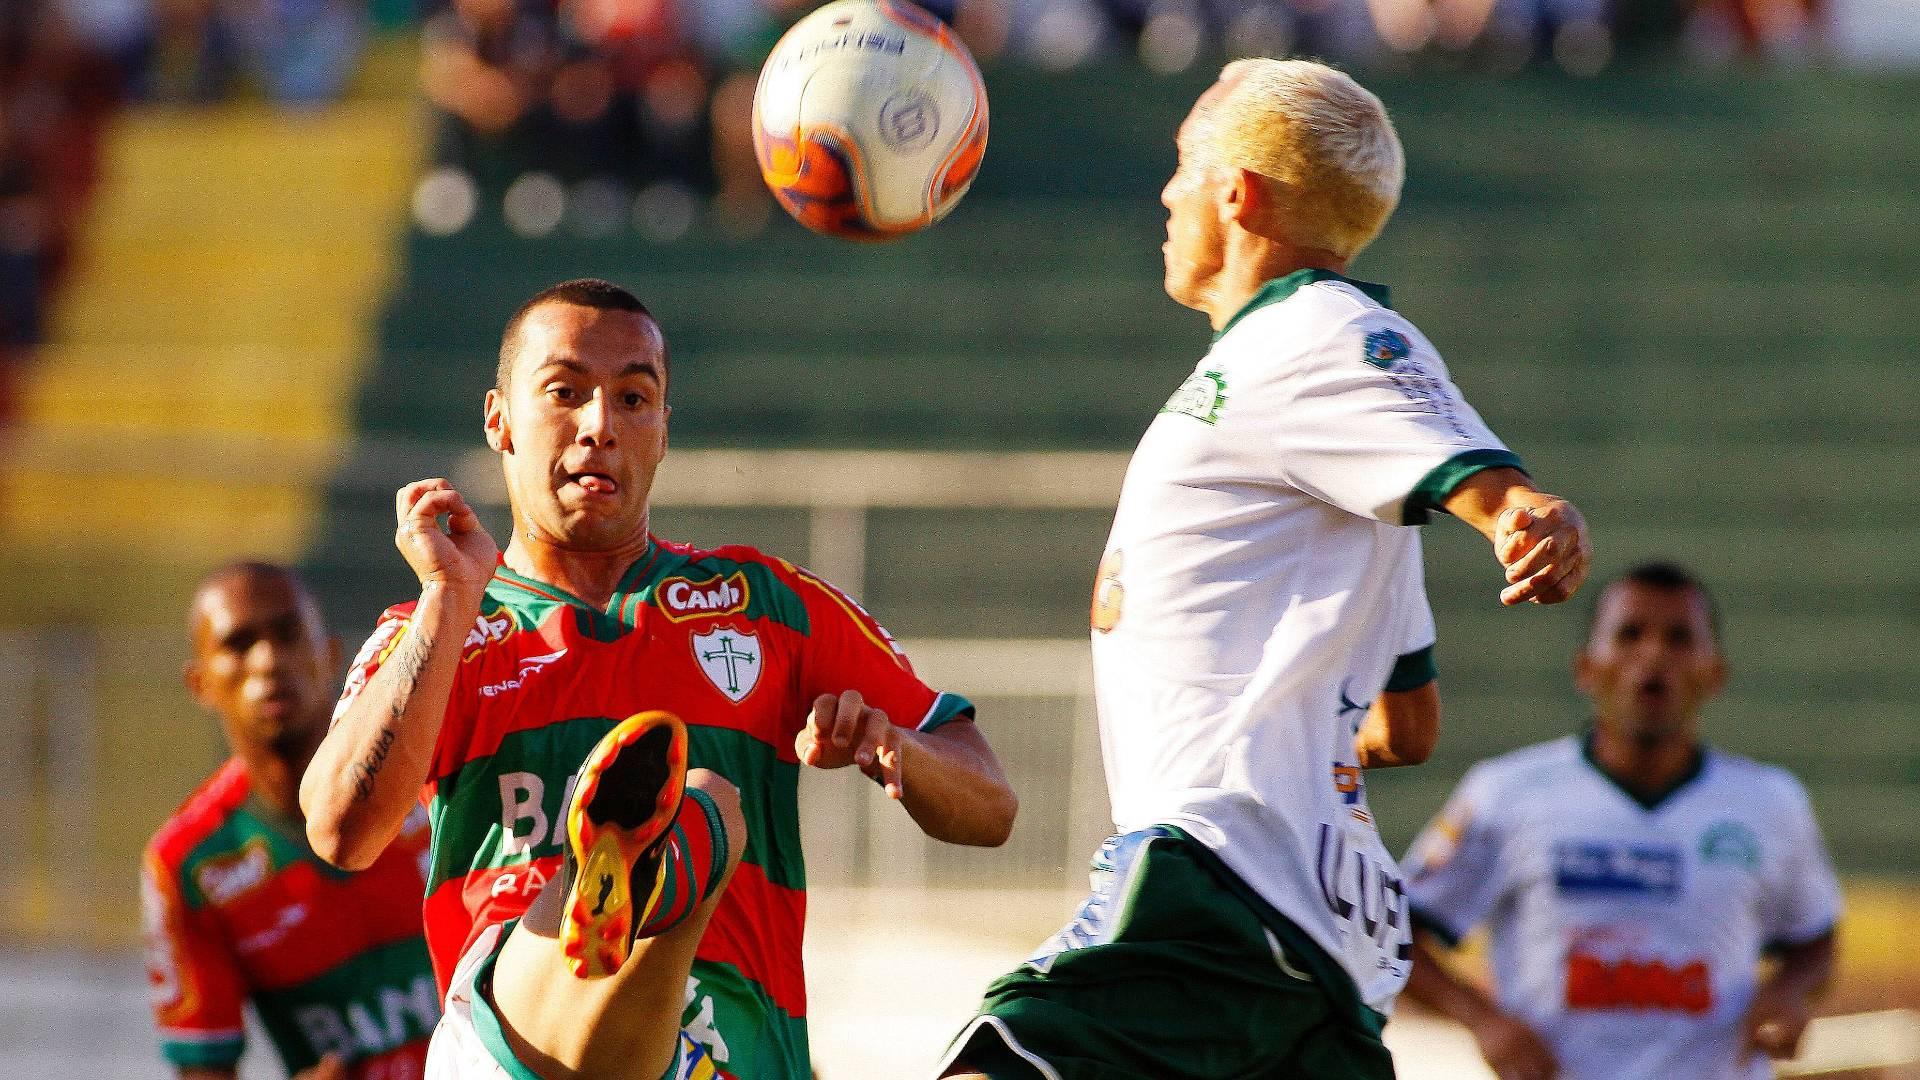 Portuguesa recebe o Icasa na última rodada do primeiro turno da Série B